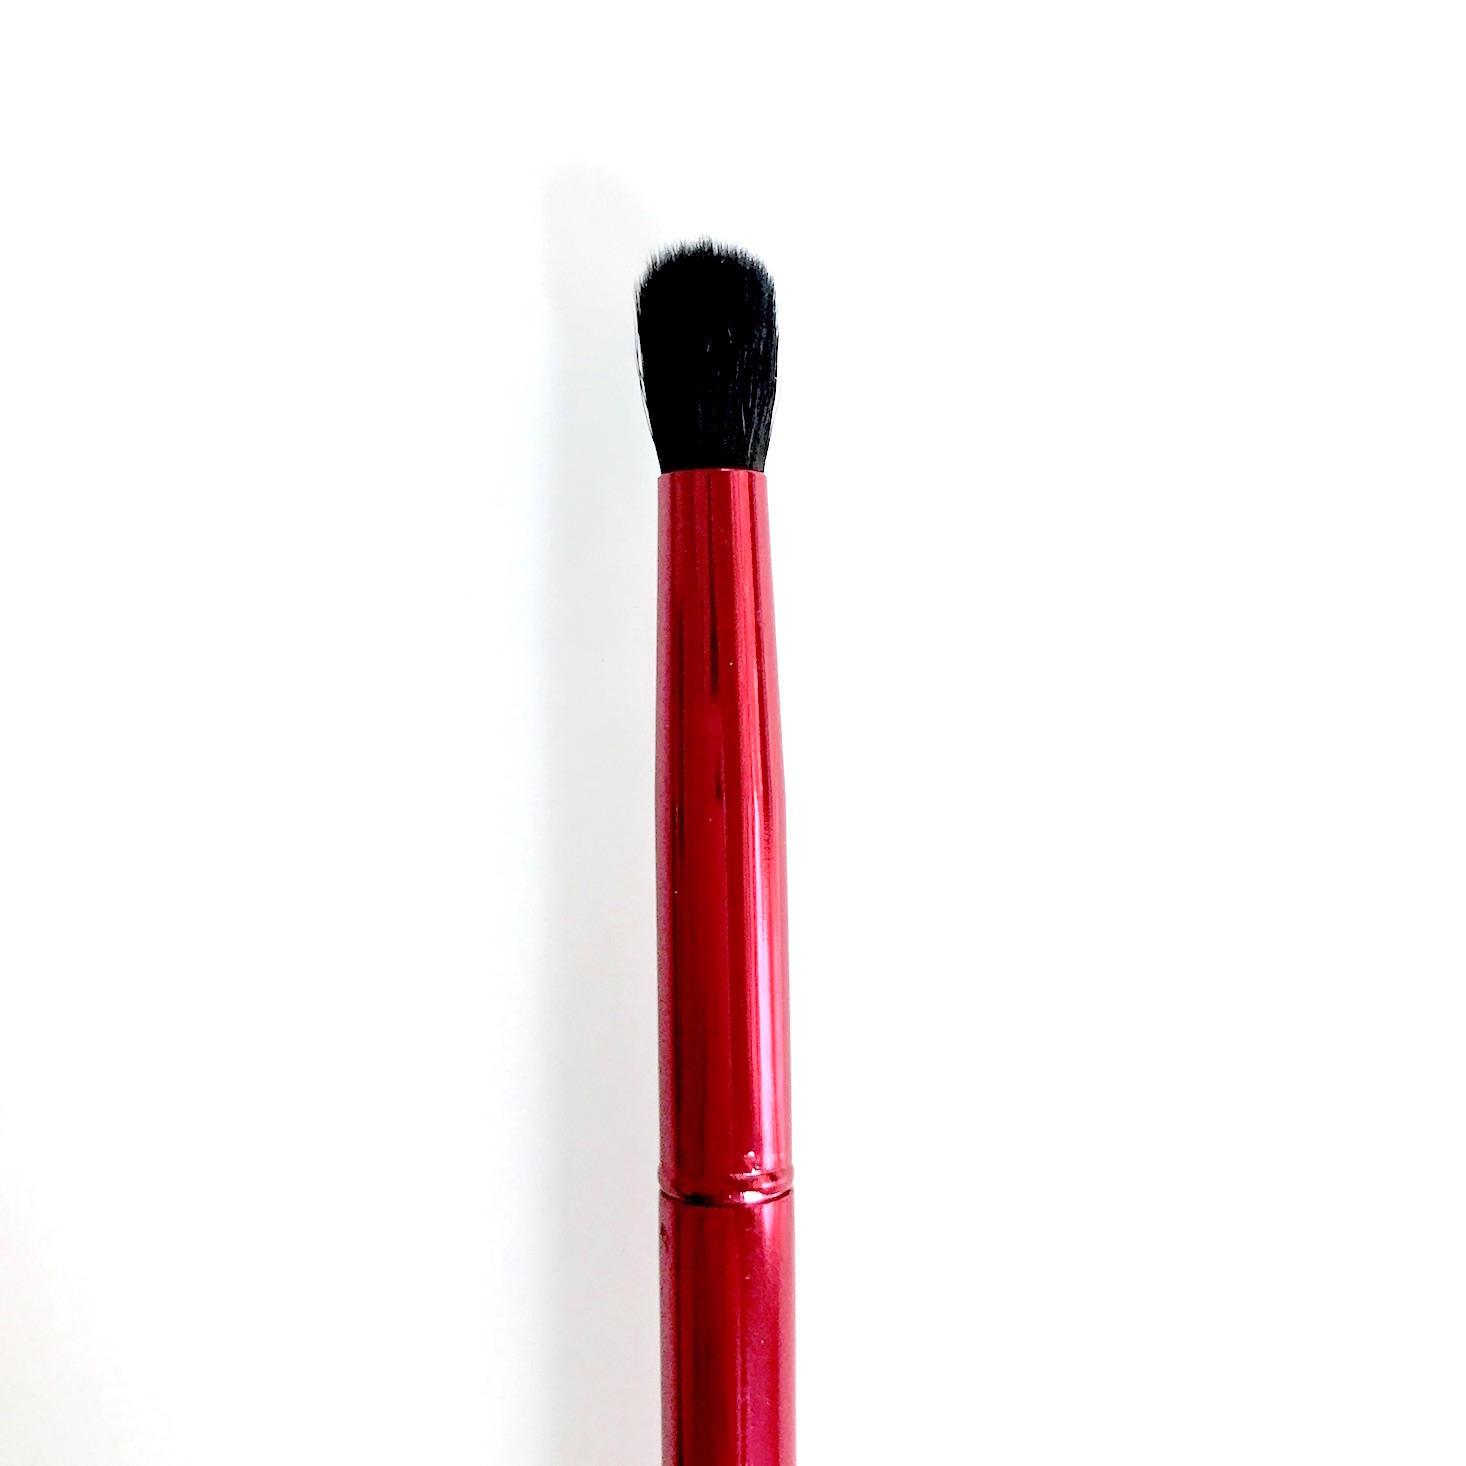 Morphe Round Contour Brush RG18 MorpheMe Collection